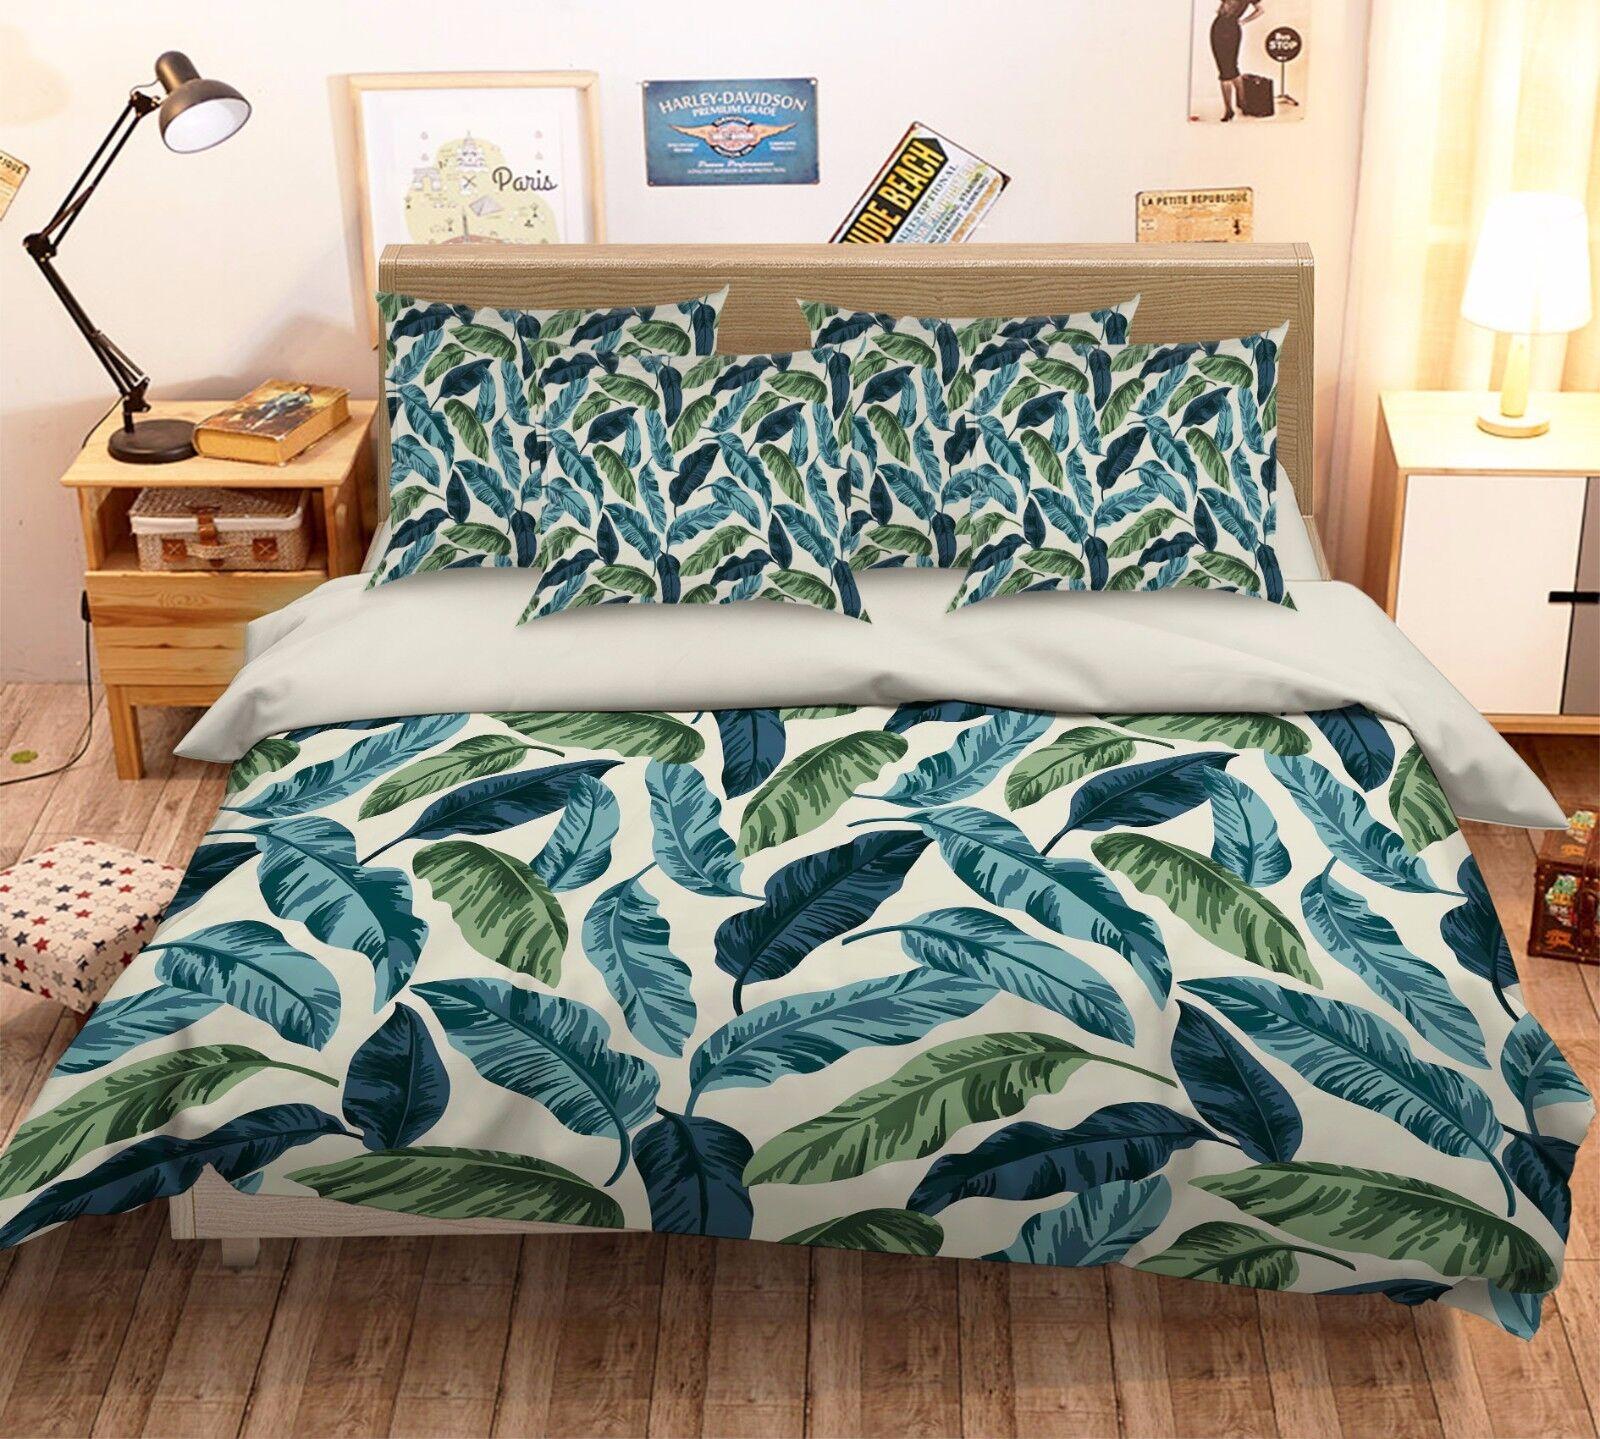 3D Leaves 391 Bett Pillowcases Quilt Duvet Startseite Set Single Königin König Größe AU